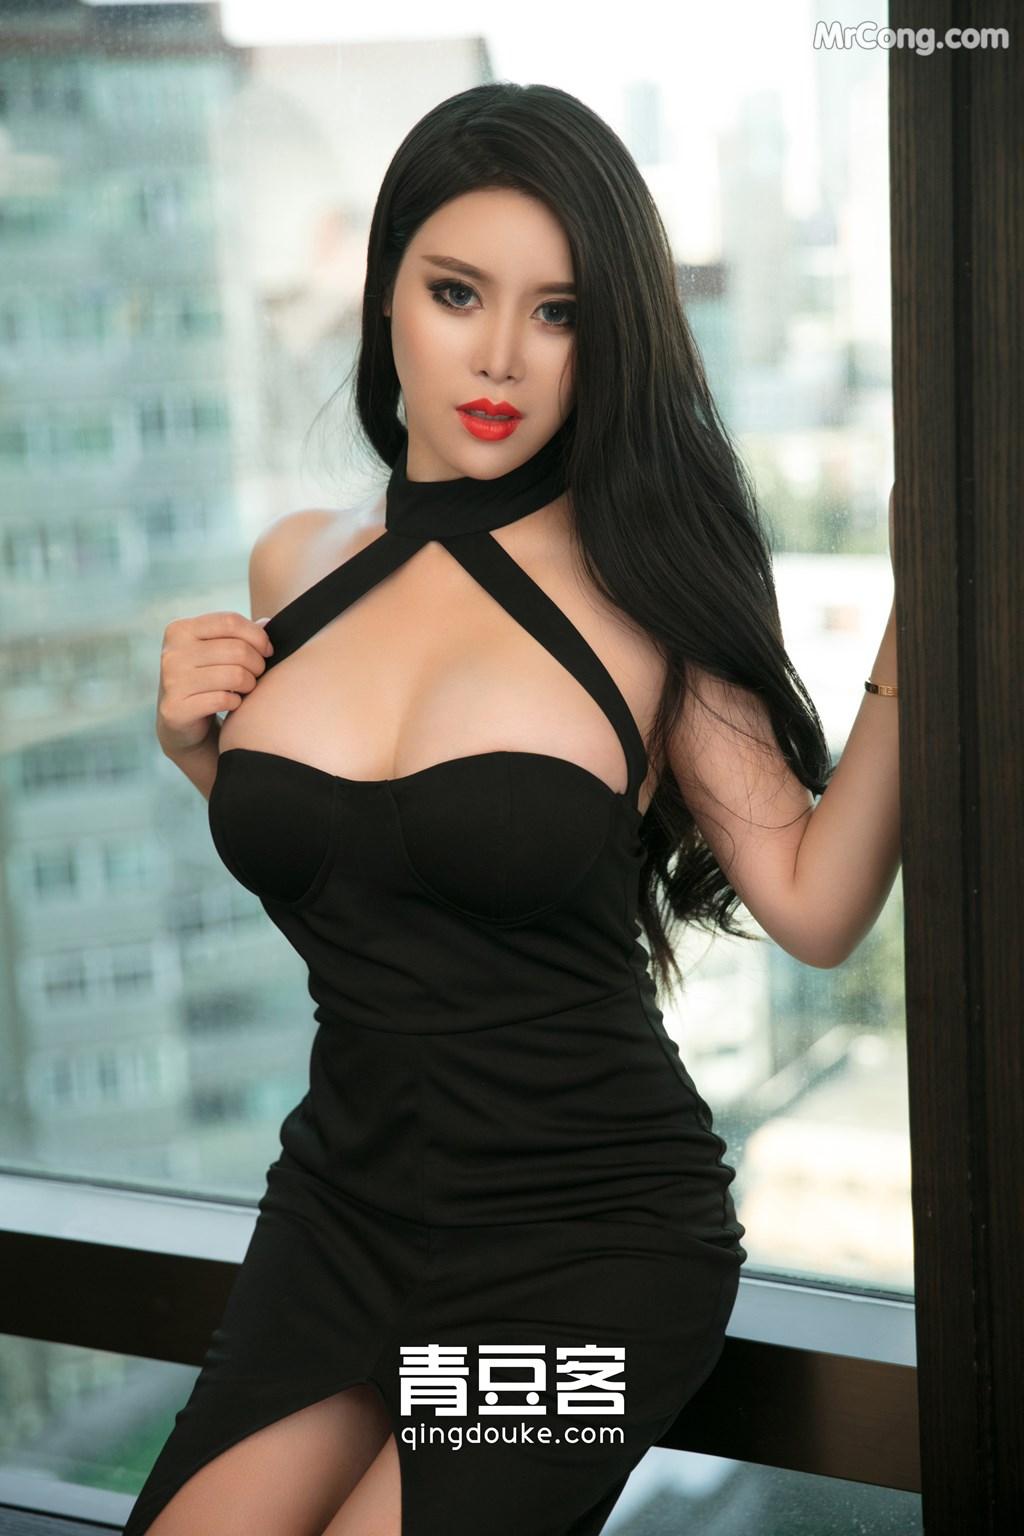 Image QingDouKe-2017-11-05-Ke-Rui-Na-MrCong.com-012 in post QingDouKe 2017-11-05: Người mẫu Ke Rui Na (可蕊娜) (48 ảnh)